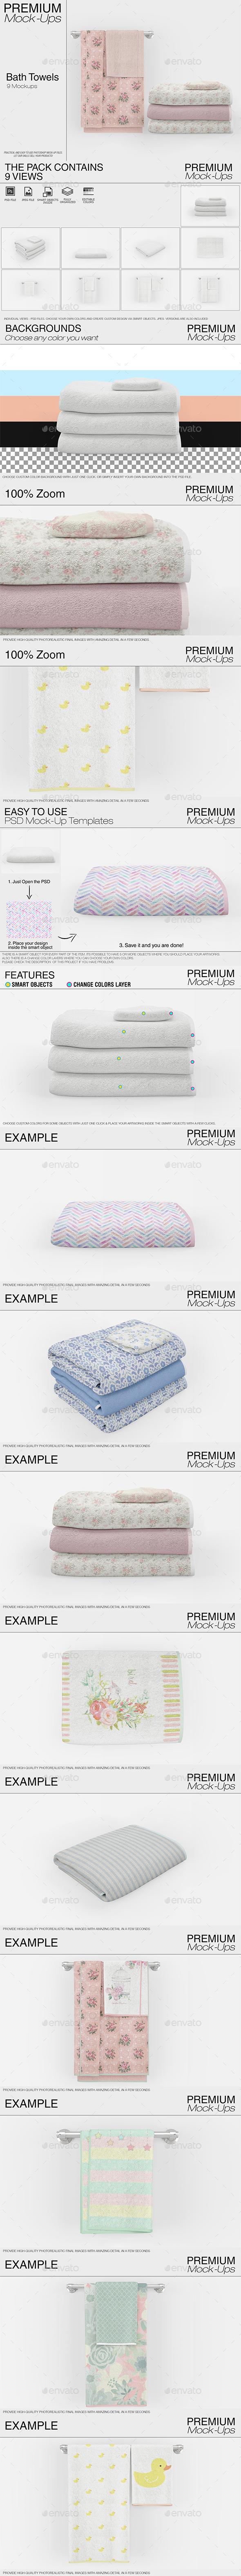 Bath Towels Mockup Set - Print Product Mock-Ups